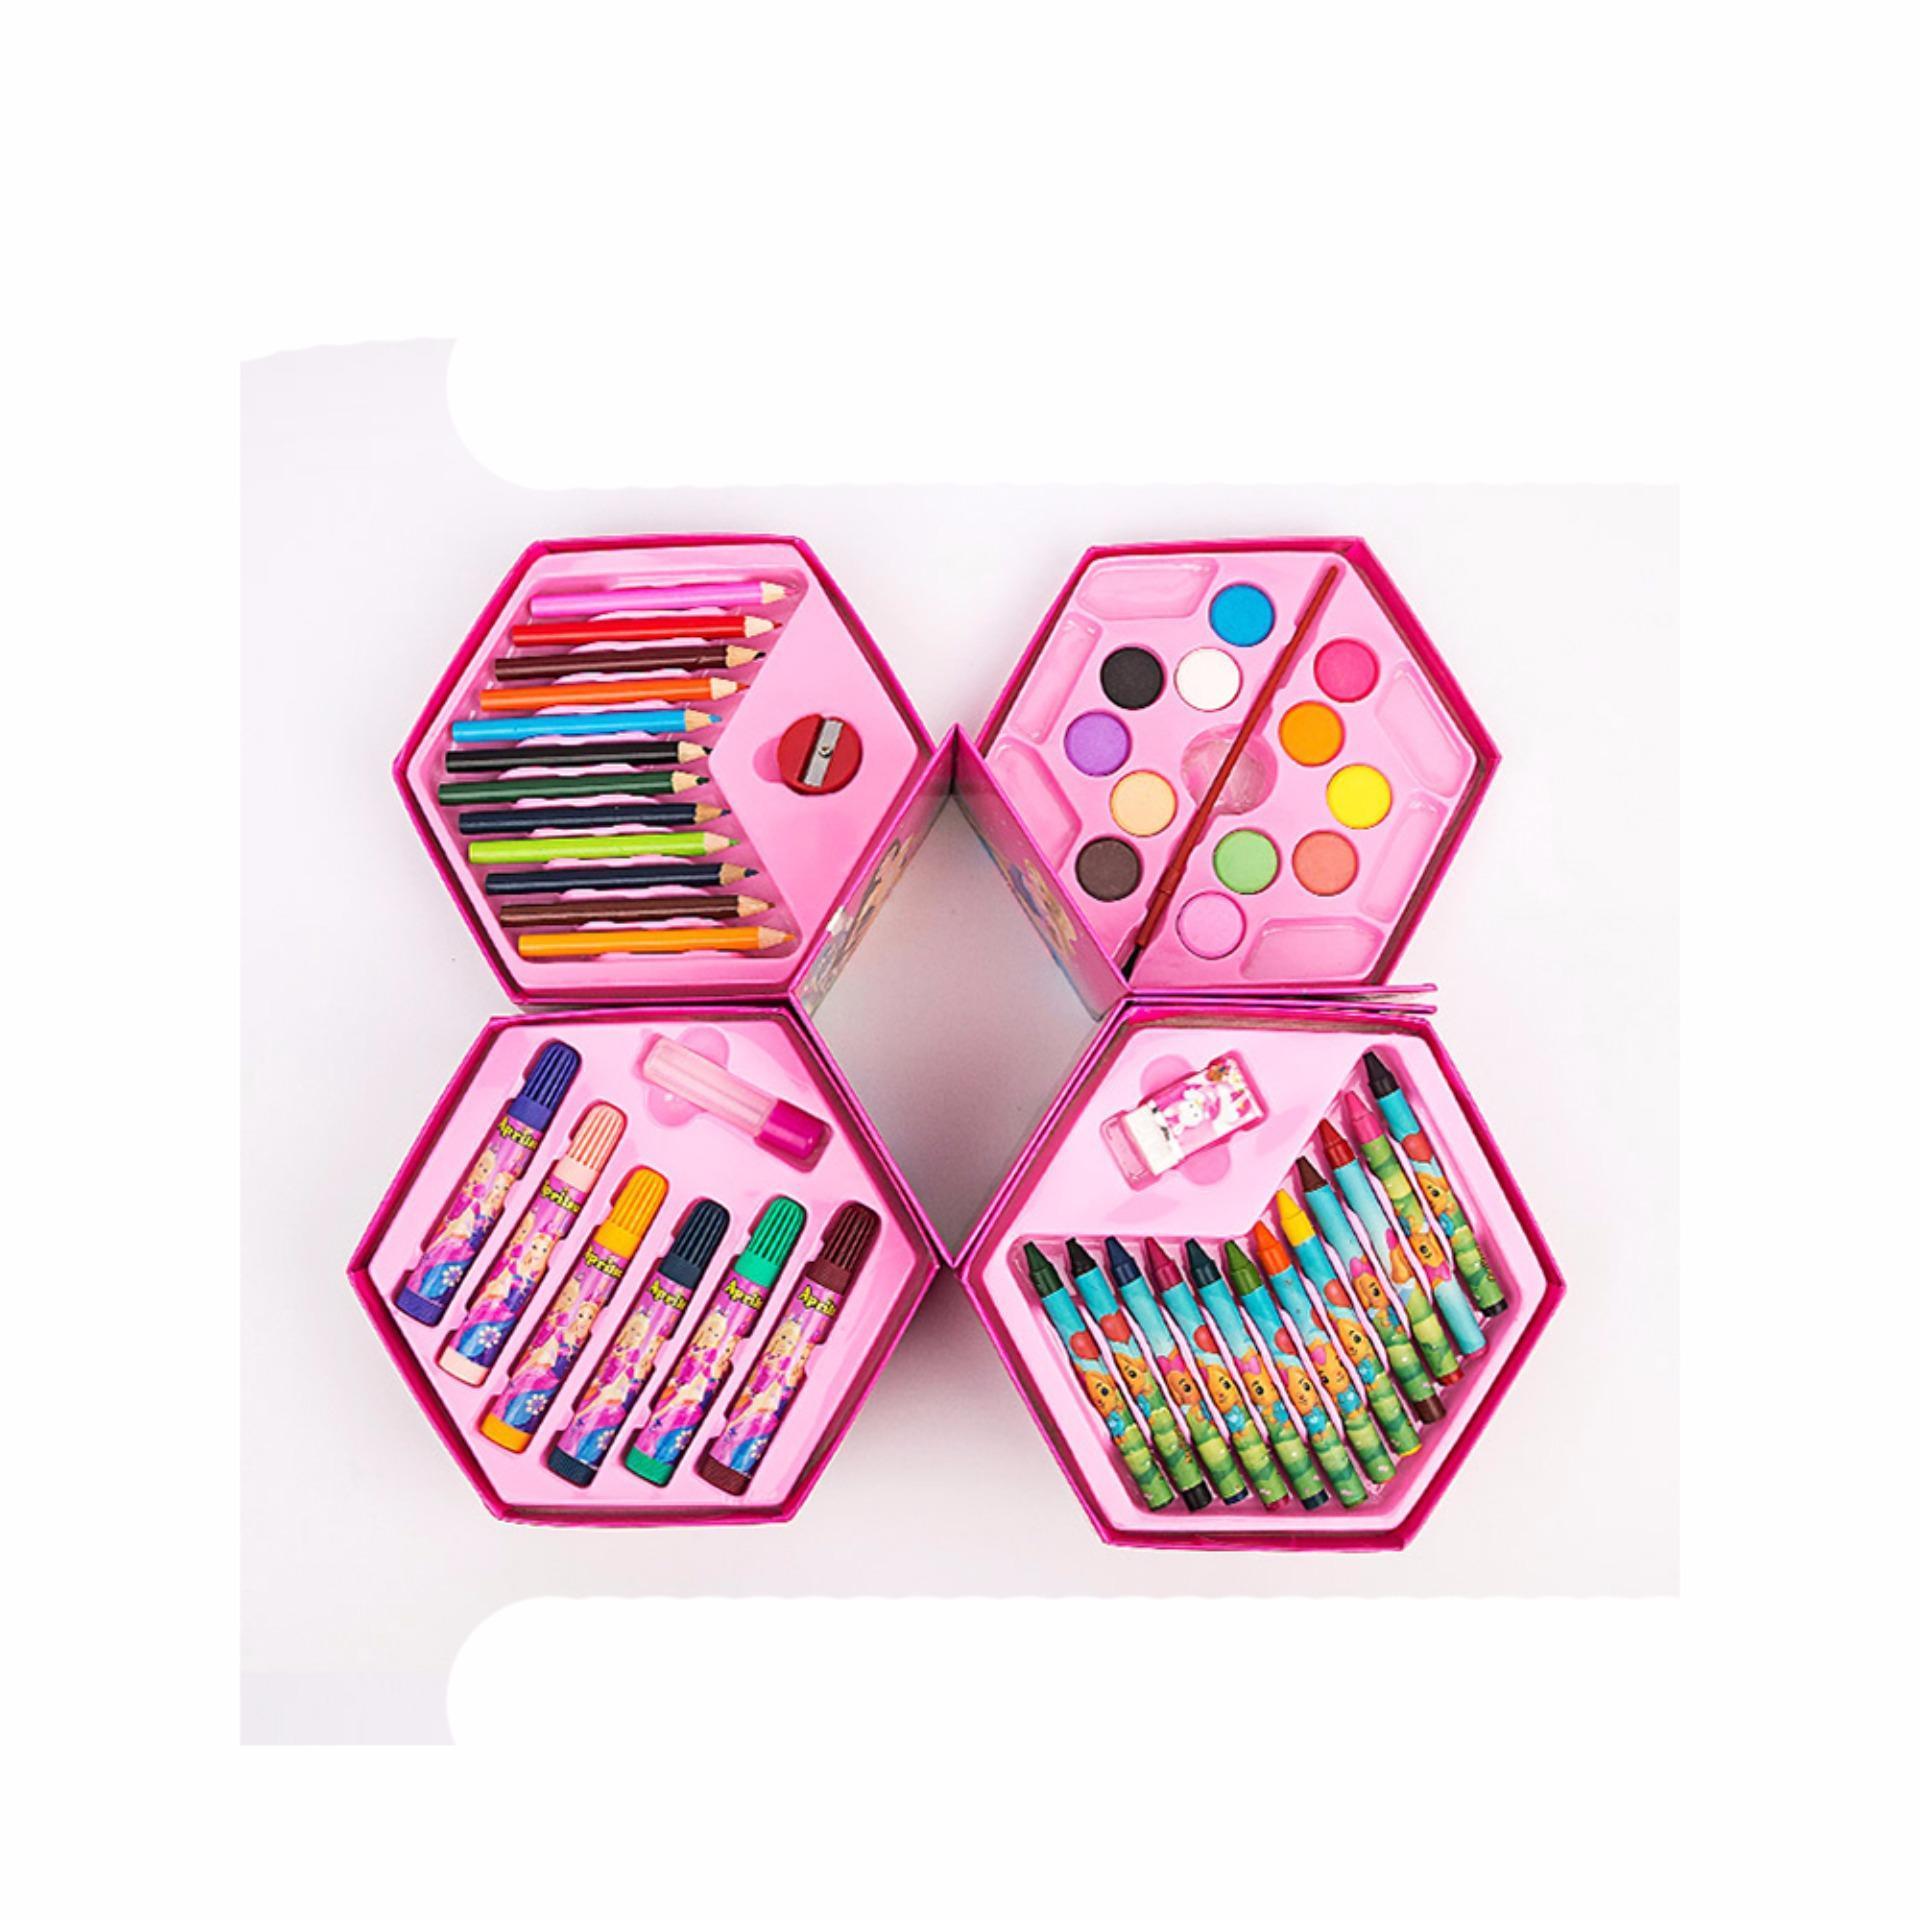 Mimosifolia Cat air pena anak-anak lukisan Stationery Set kotak hadiah krayon berwarna pensil Anak Sekolah Seni Stationery Set 46PCS Pink - intl